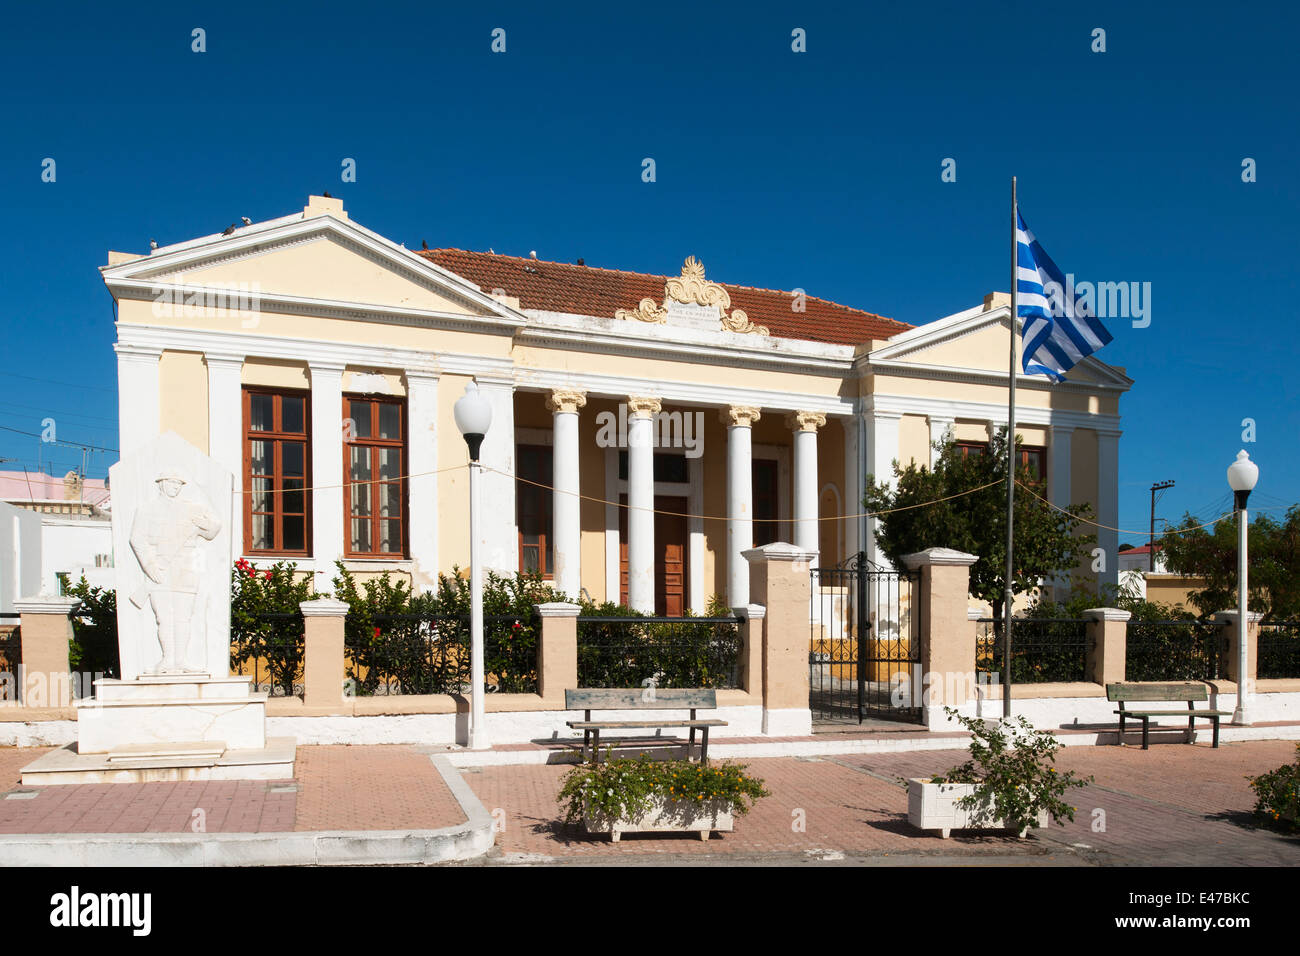 Griechenland, Rhodos, Masari, Rathaus - Stock Image